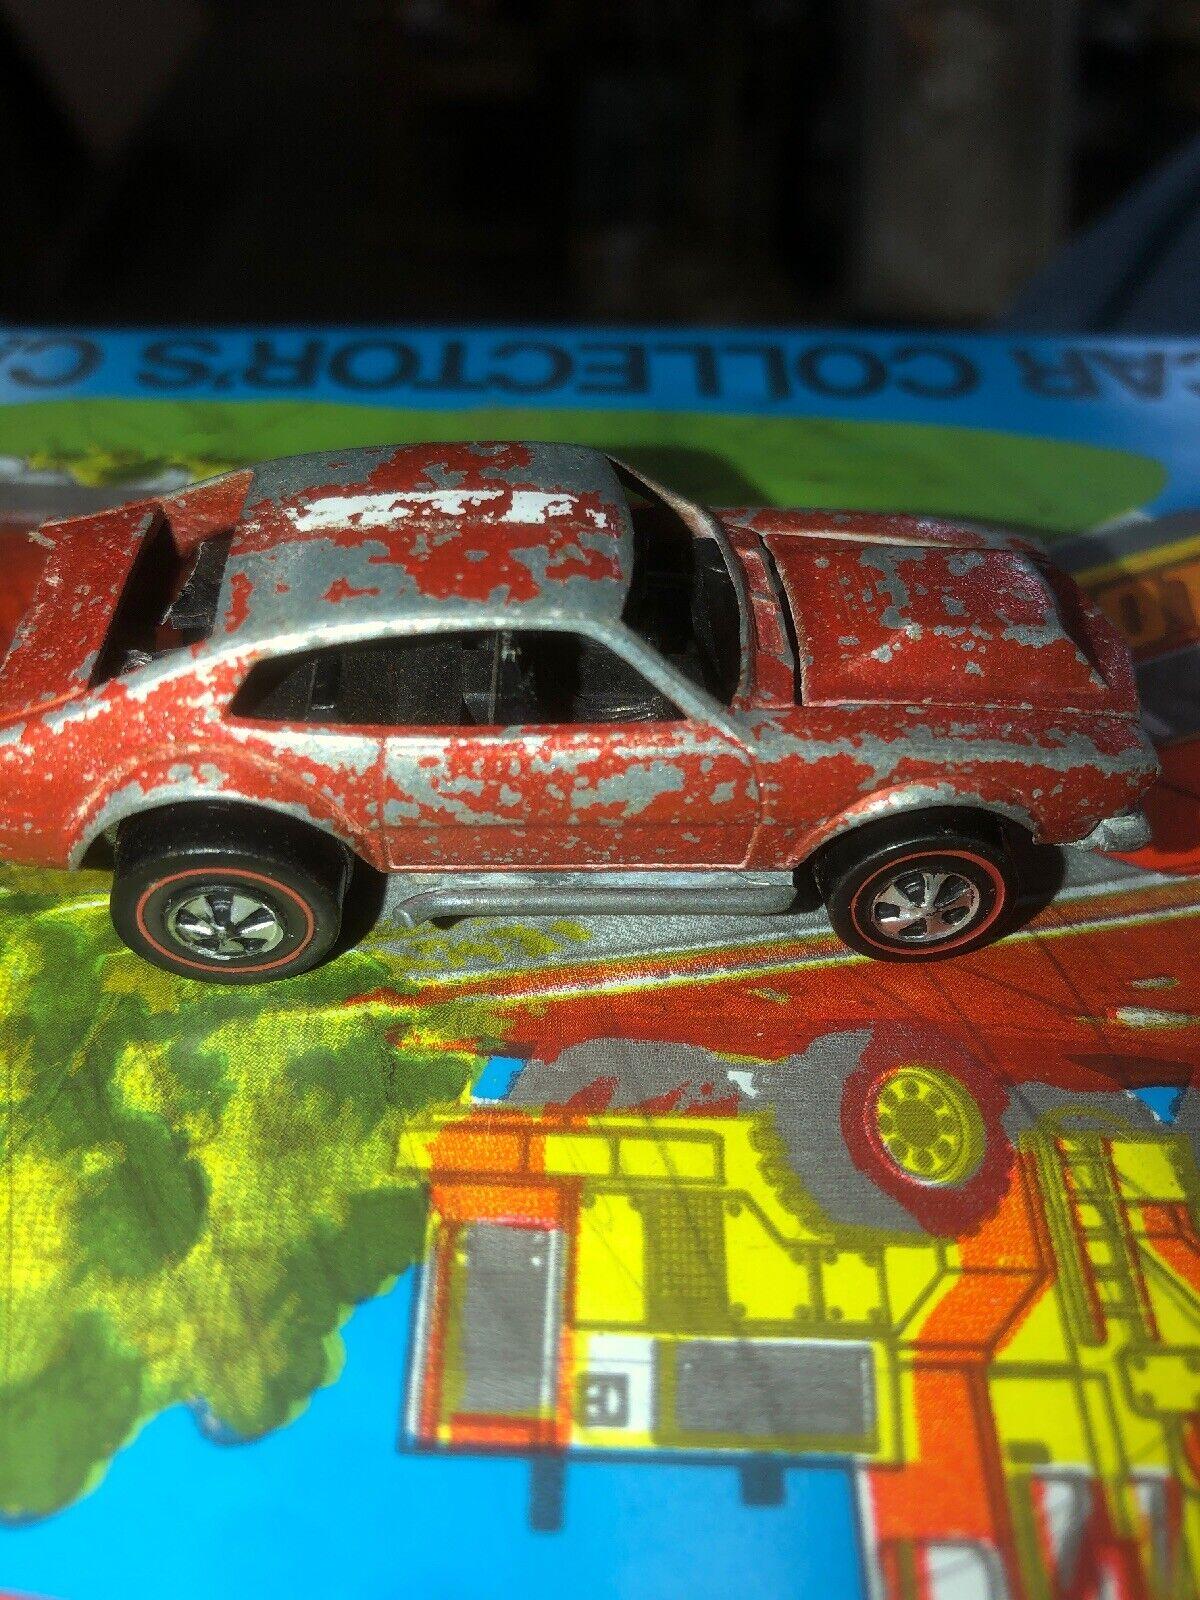 1970 Hot Wheels rotline Mighty Maverick TUF HK Orange